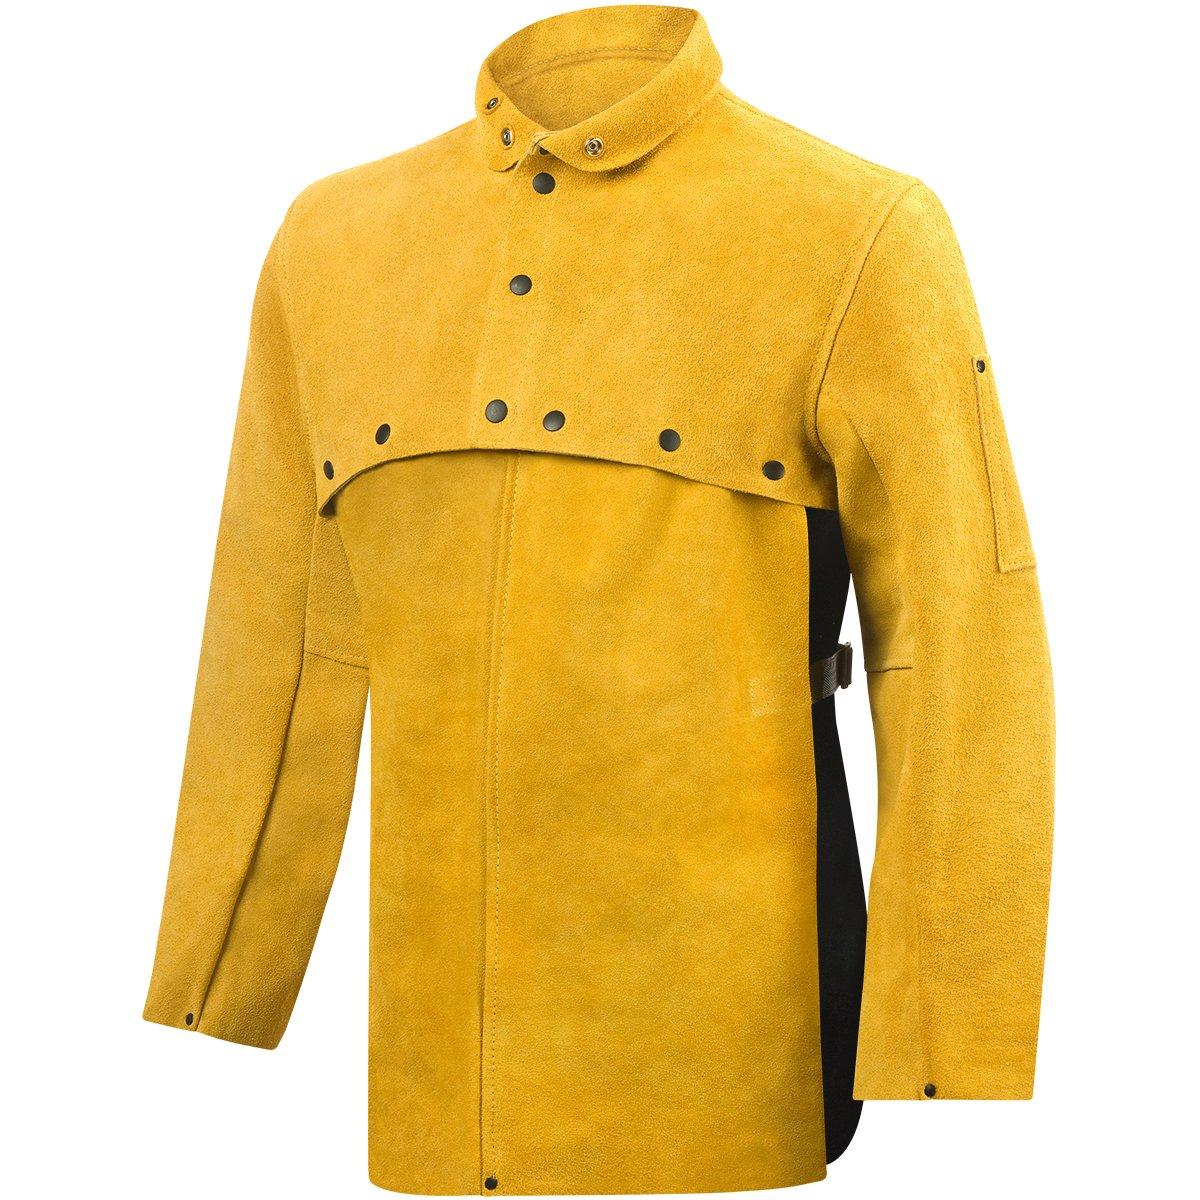 Steiner 8213-L Standard Leather Cape Sleeve with 20'' Bib, Standard Bourbon Split, Large